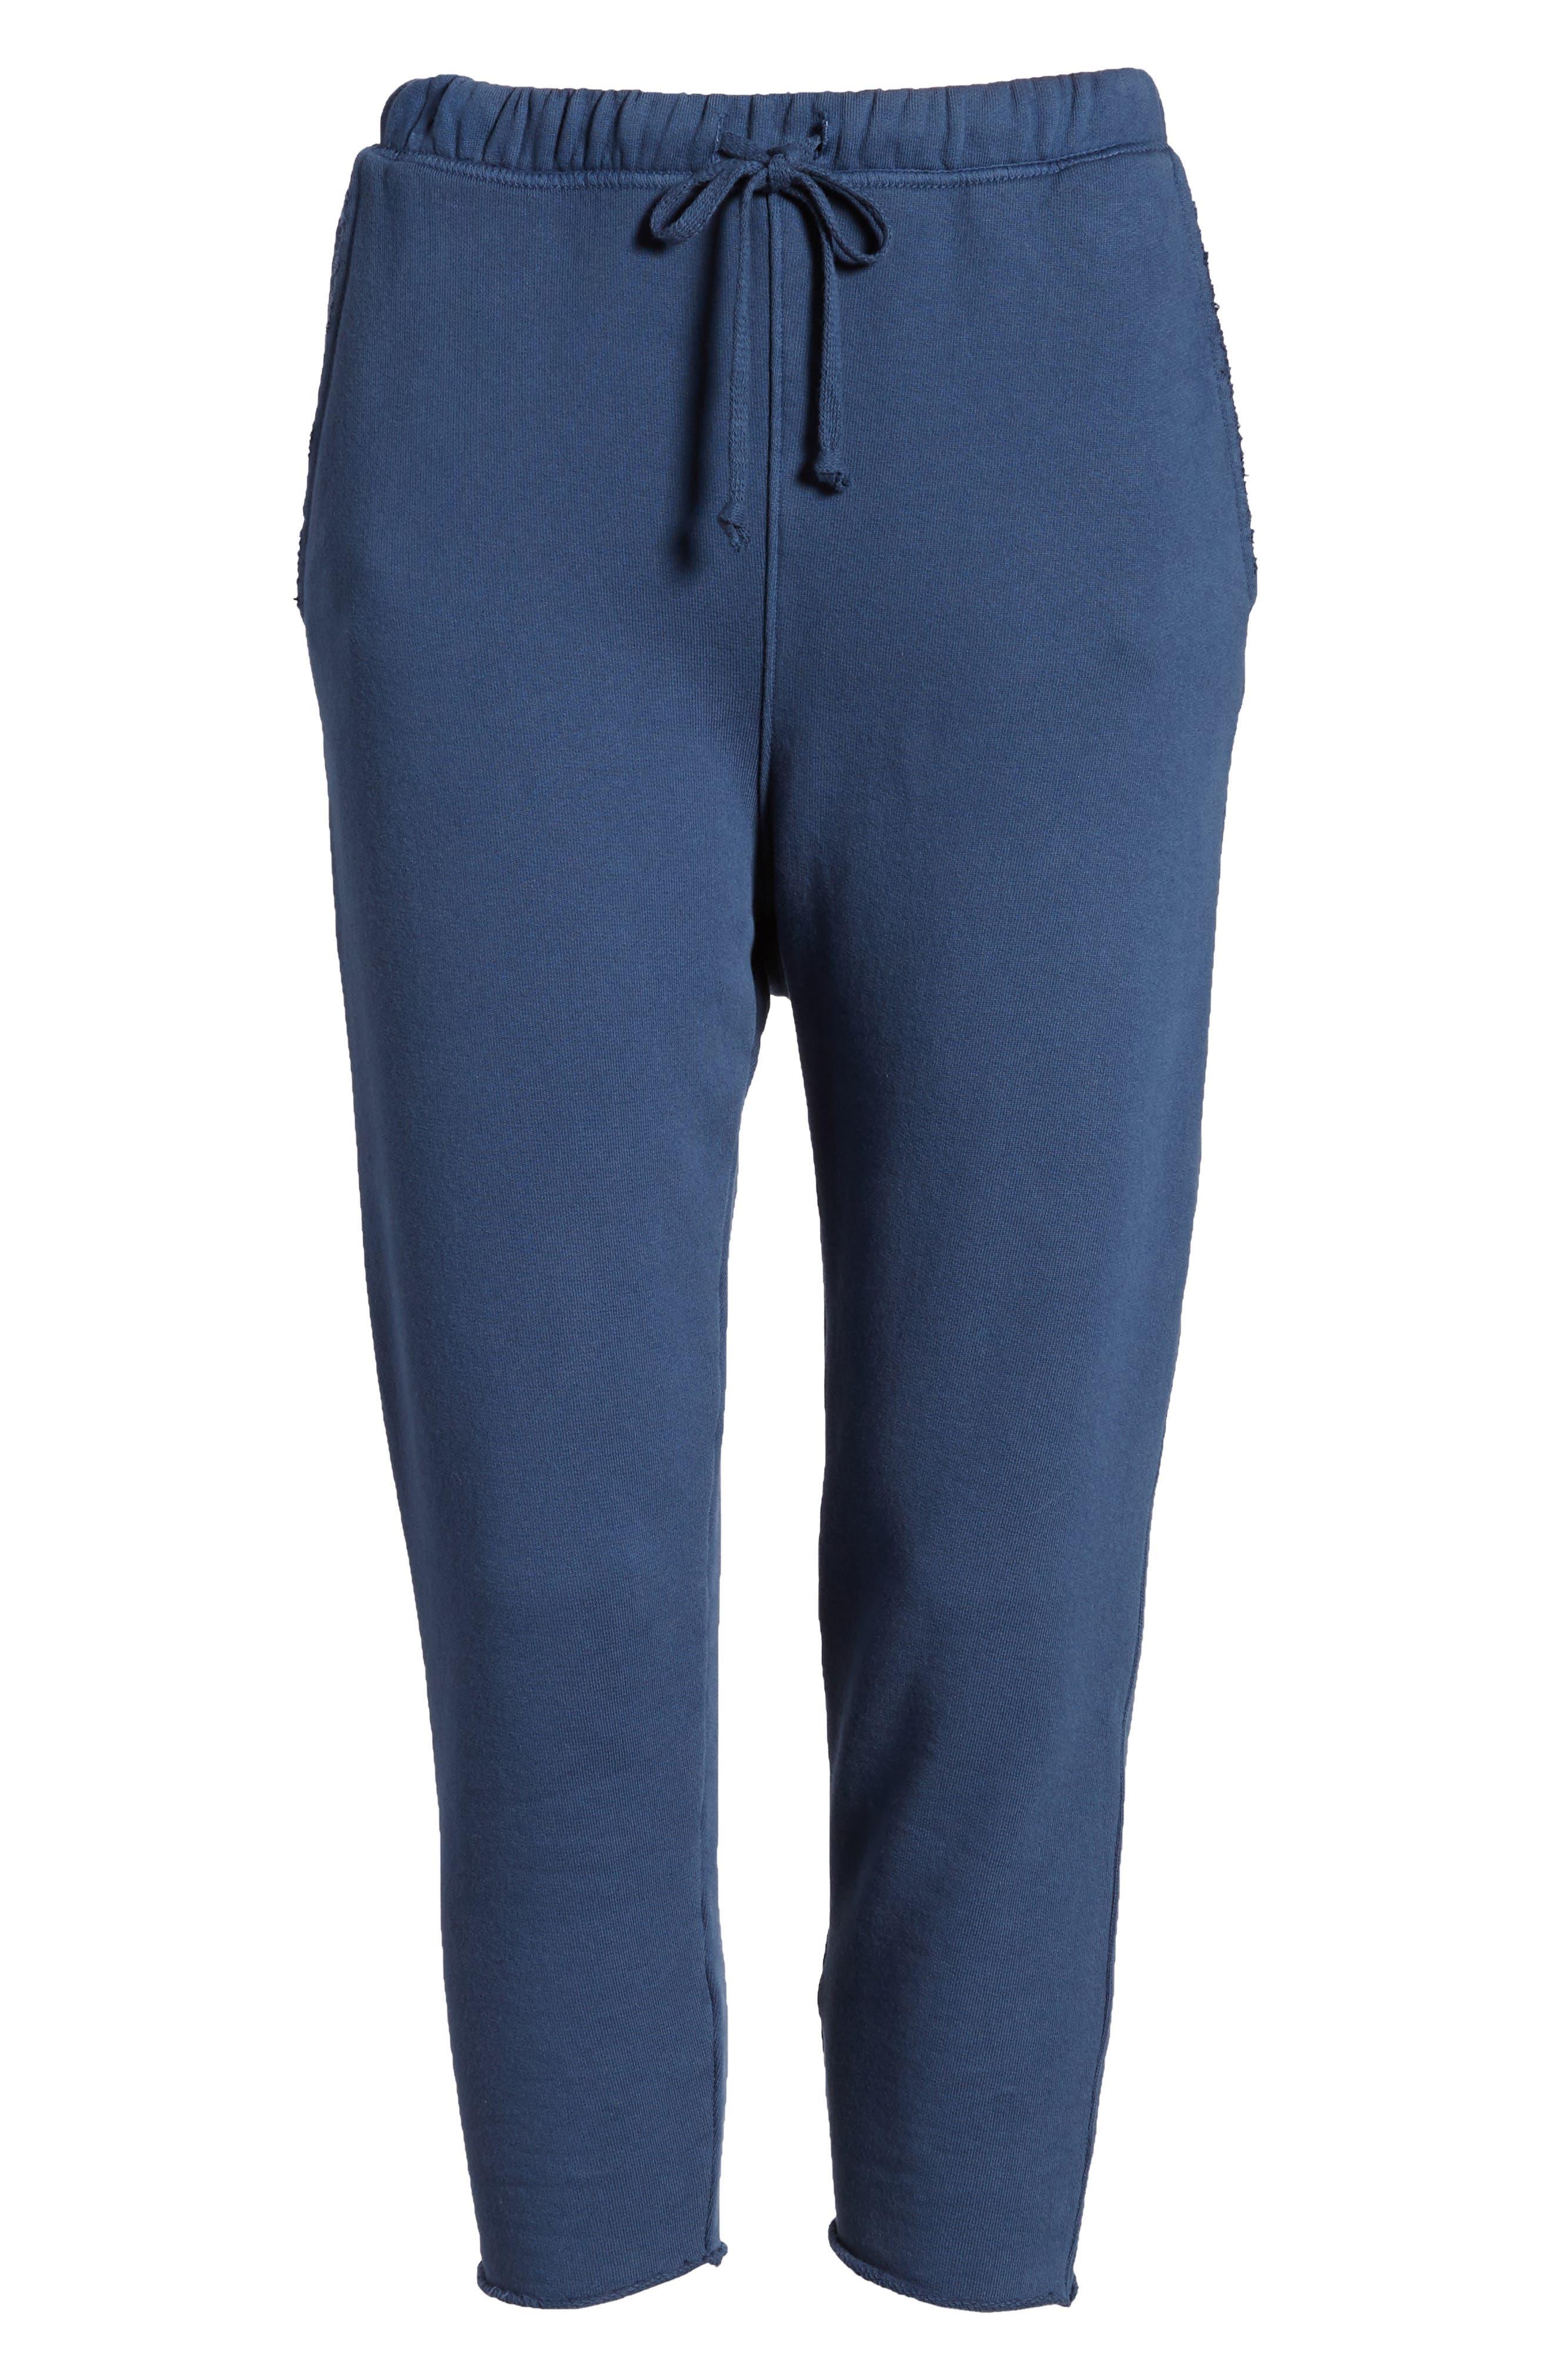 Raw Hem Crop Sweatpants,                             Alternate thumbnail 7, color,                             410